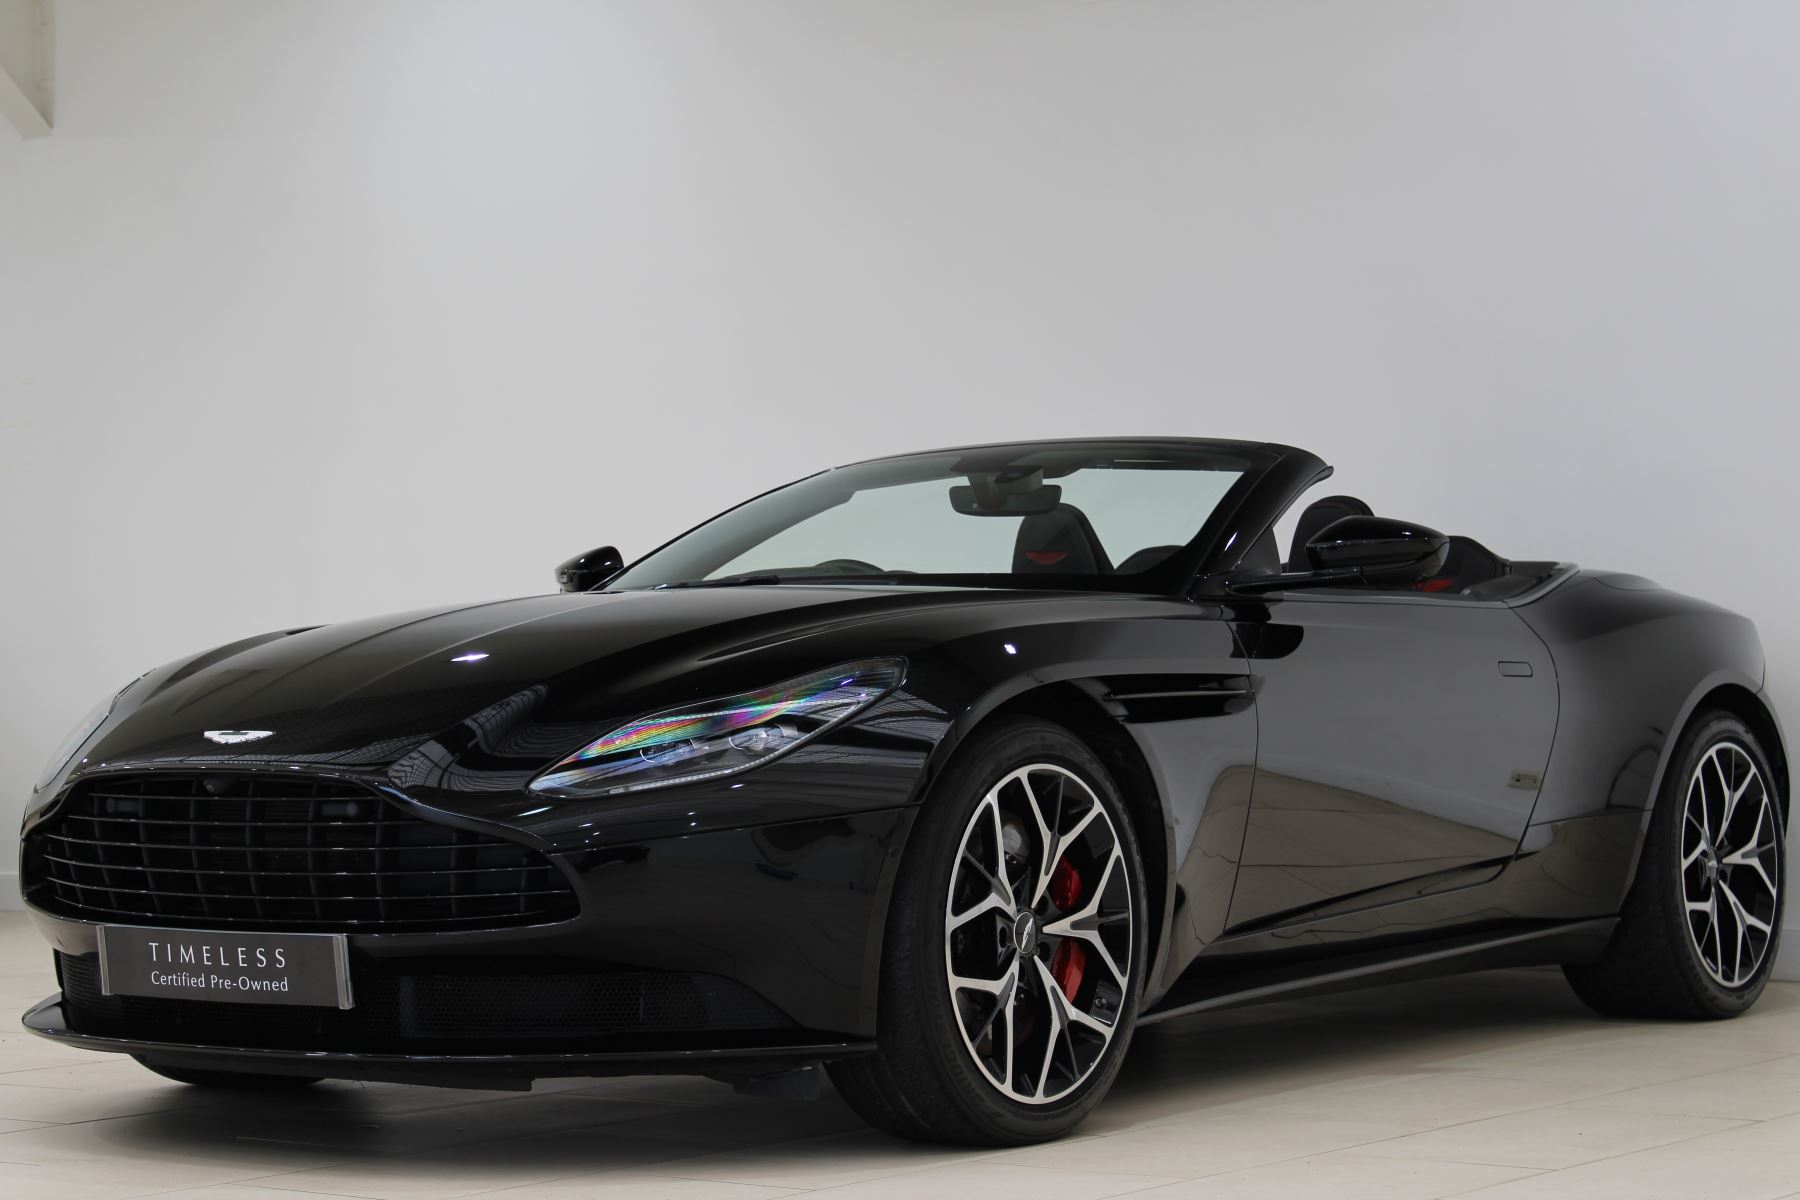 Aston Martin DB11 Volante V8 2dr Touchtronic image 3